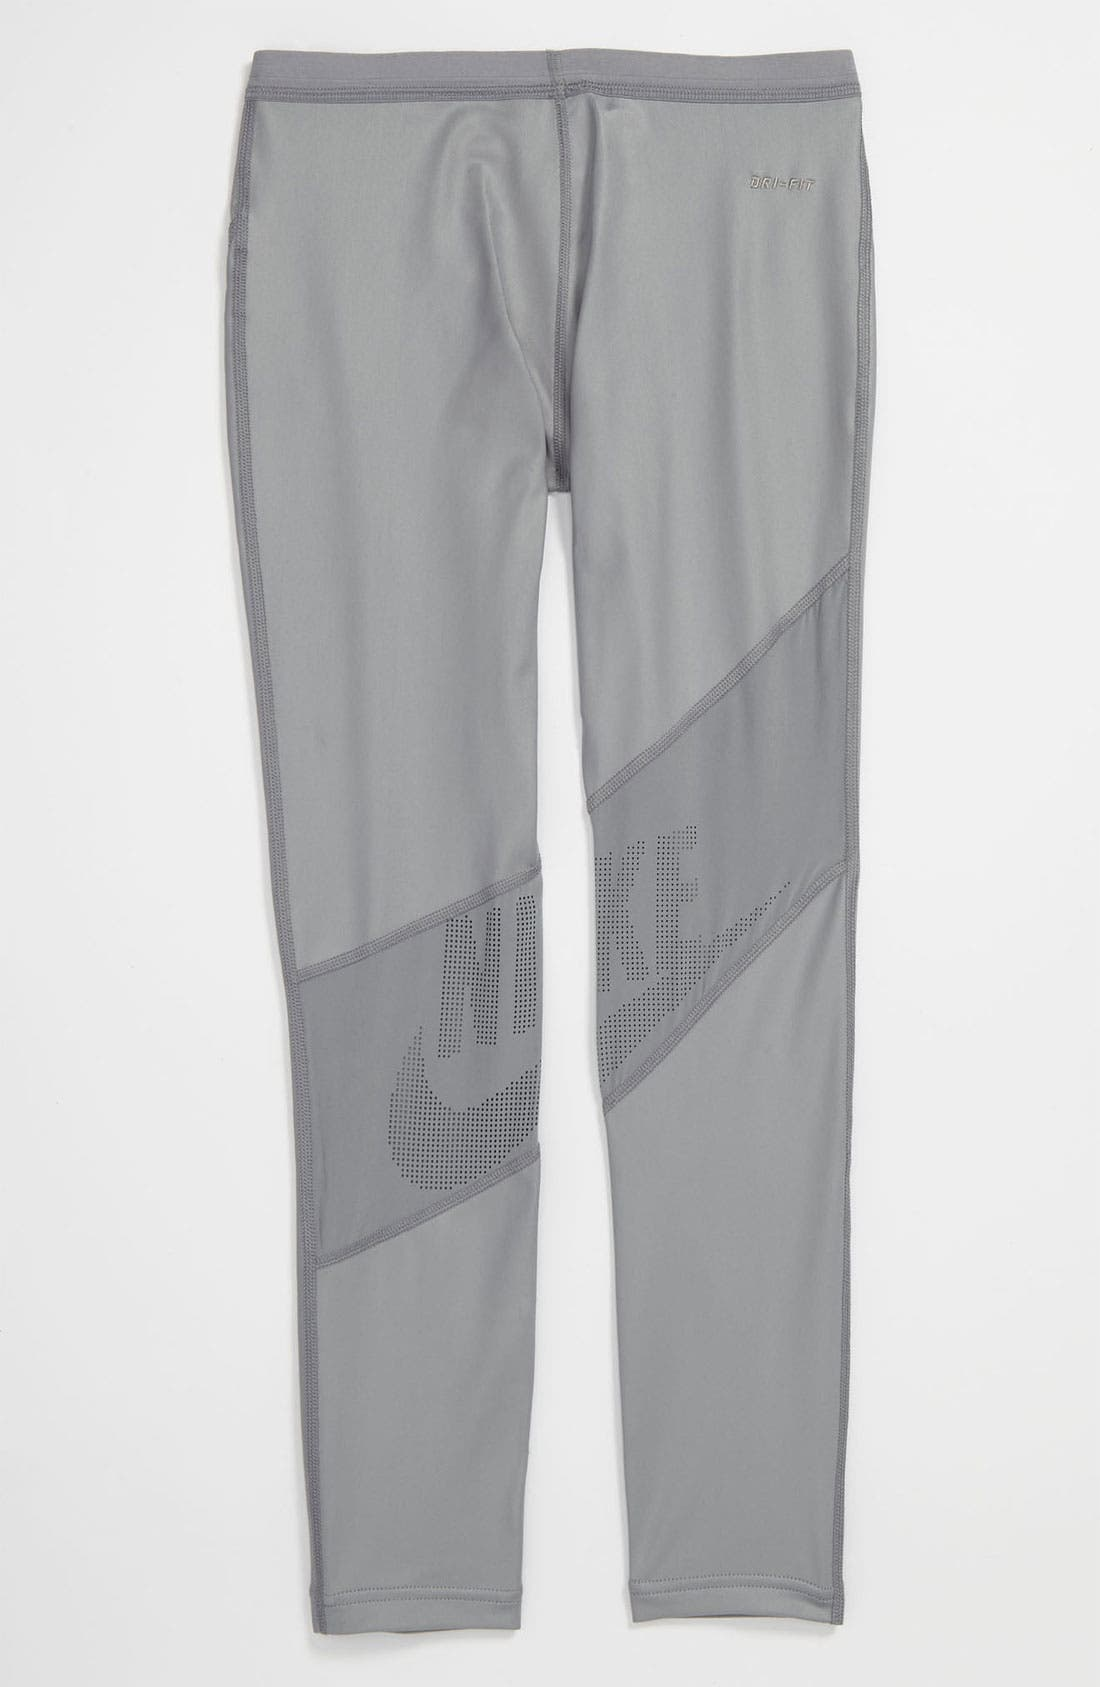 Alternate Image 2  - Nike 'RCO' Tights (Big Girls)